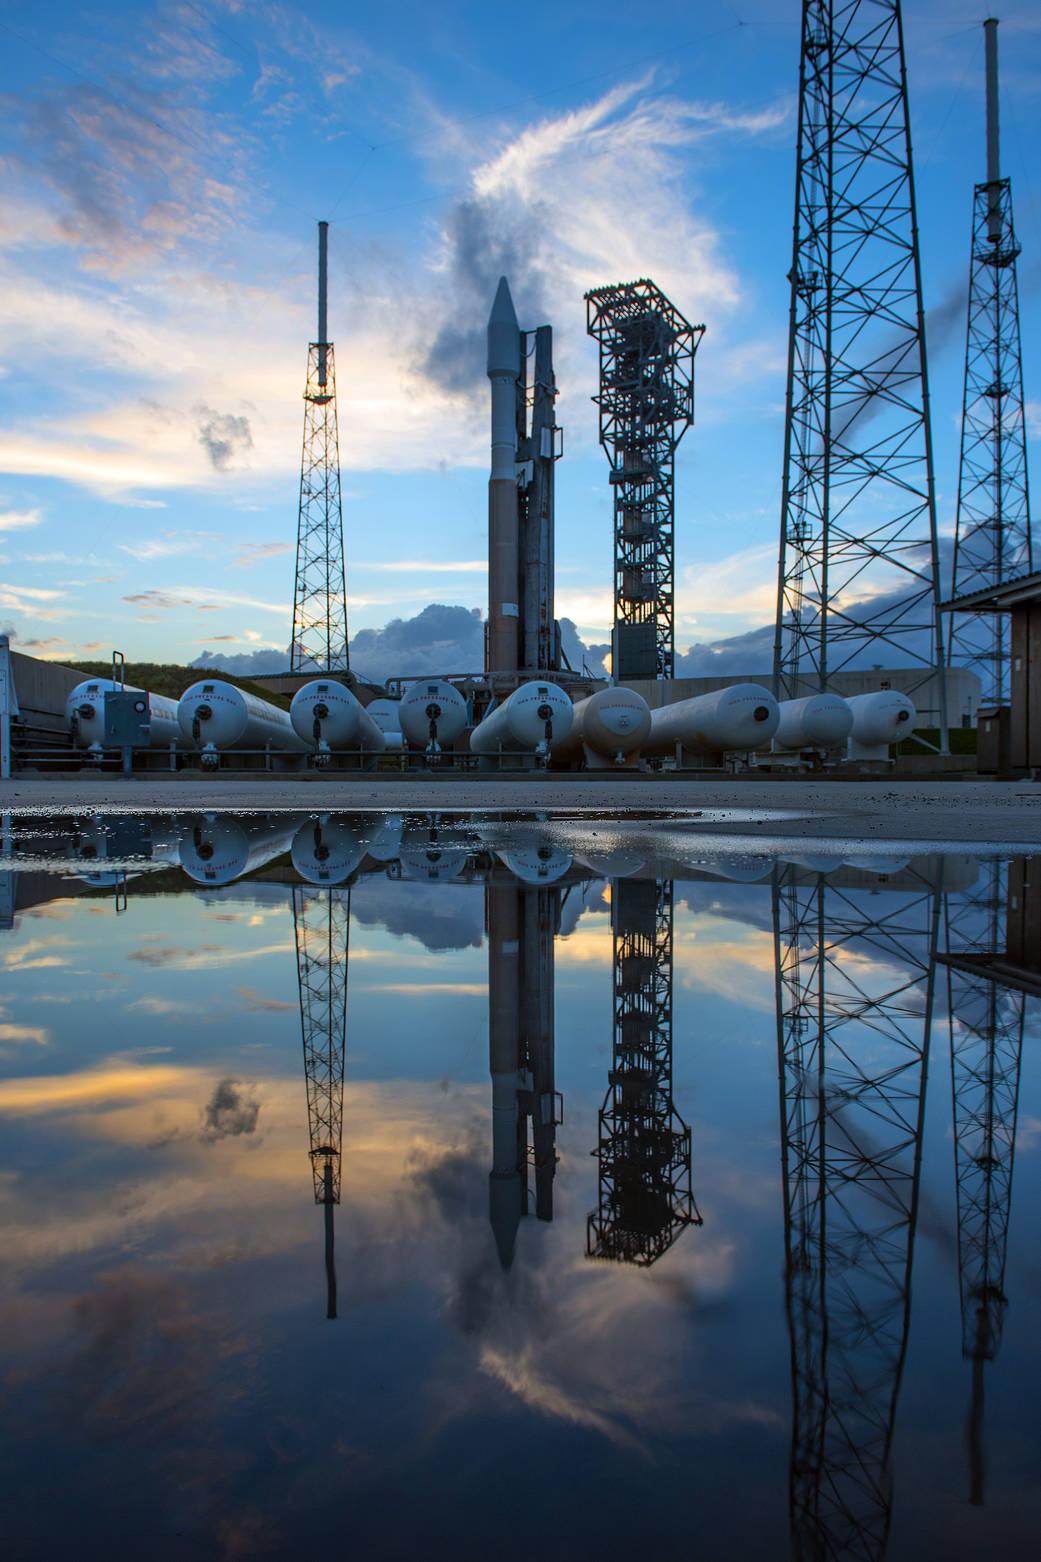 ULA Atlas V rocket with Cygnus rocket aboard at launch pad, reflected in pool of water below